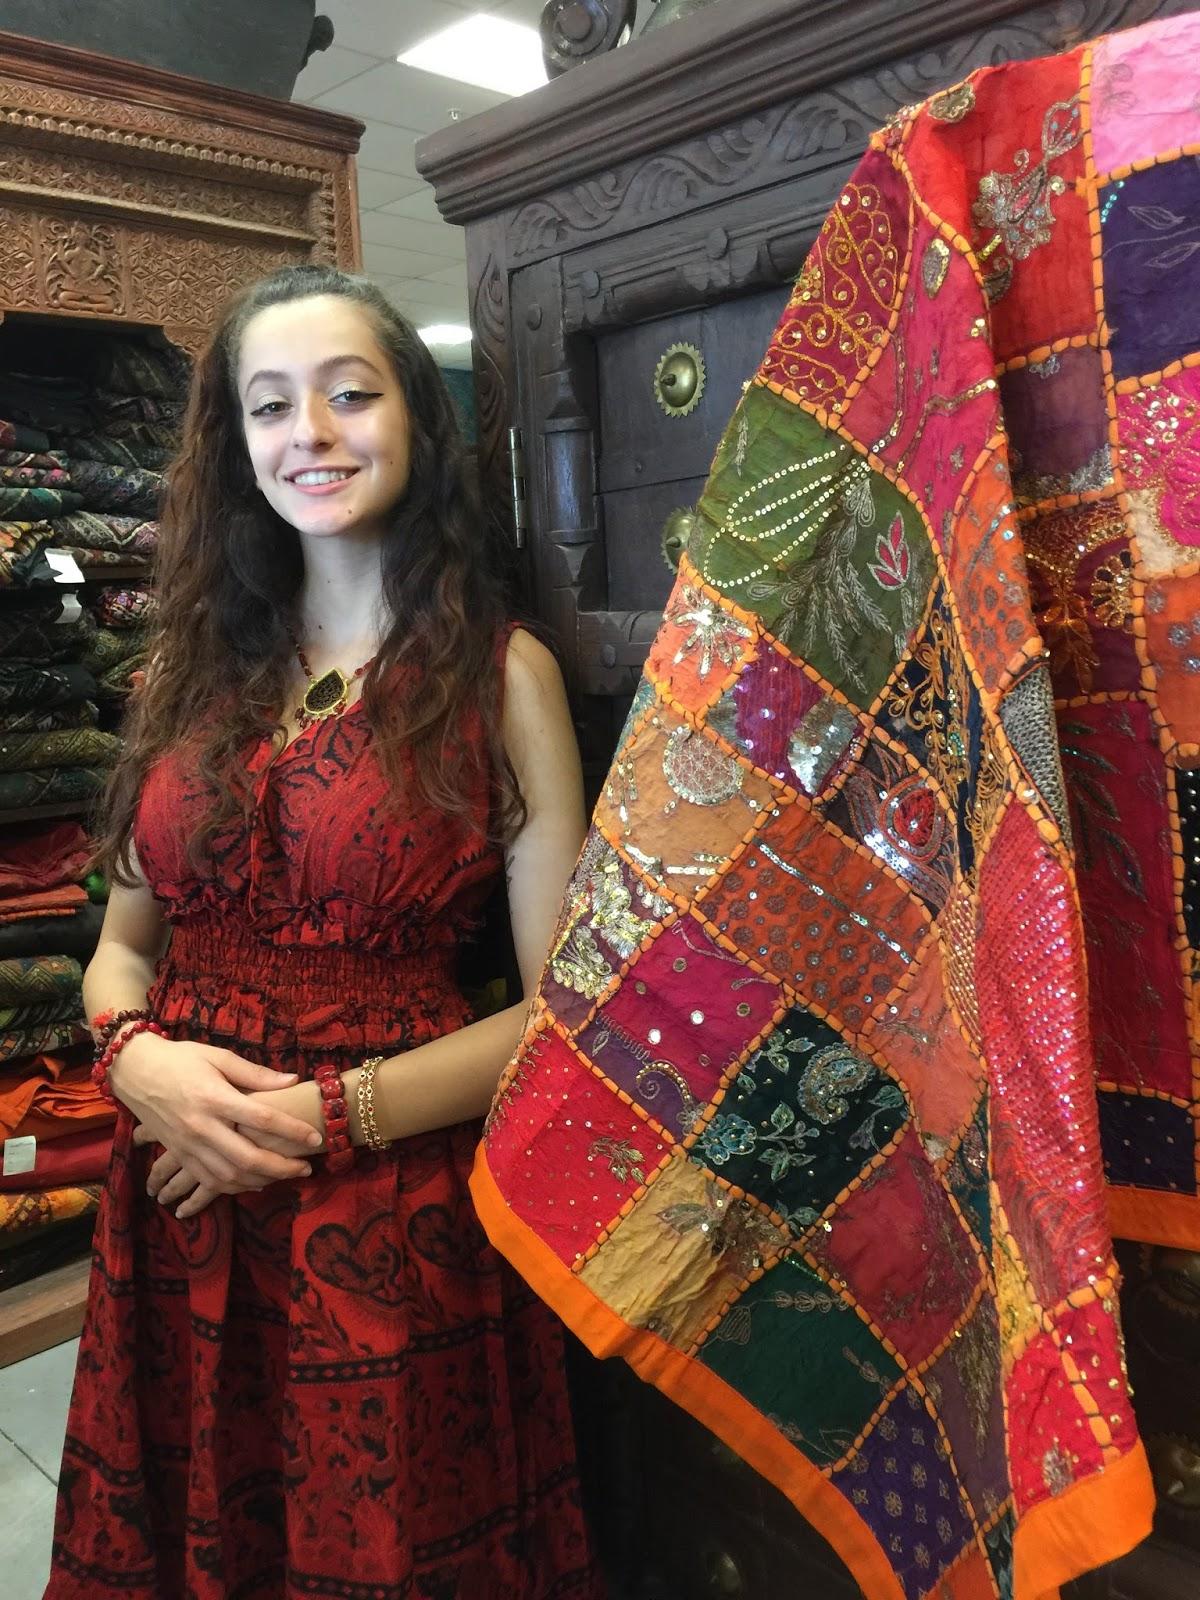 Mogul interior designs boho vintage sari patchwork for Mogul interior designs